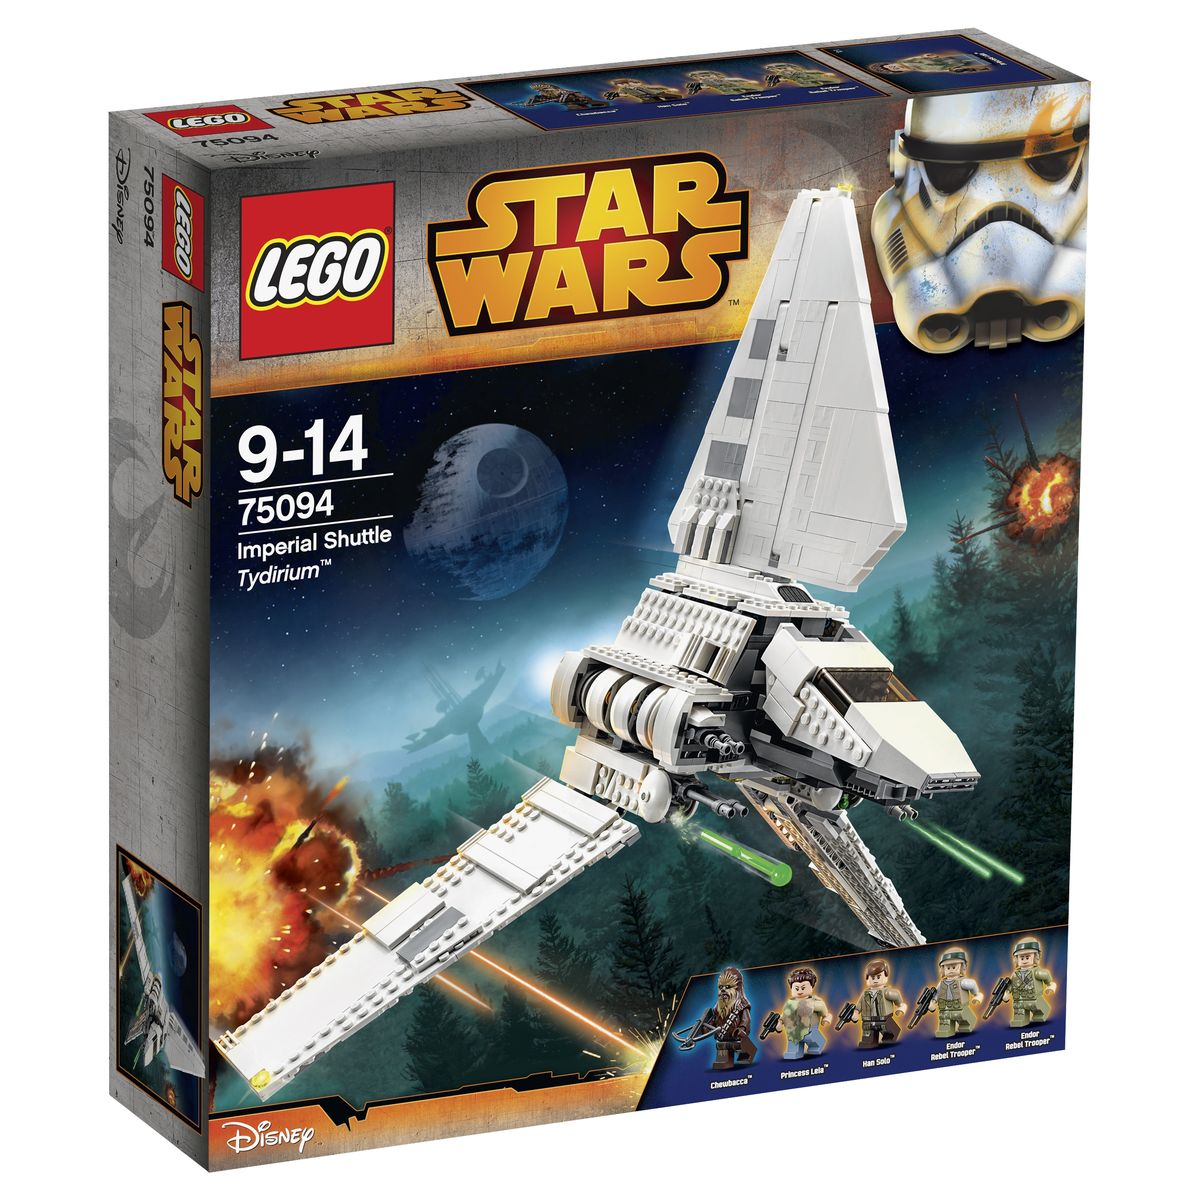 LEGO Star Wars Конструктор Имперский шаттл Тайдириум 75094